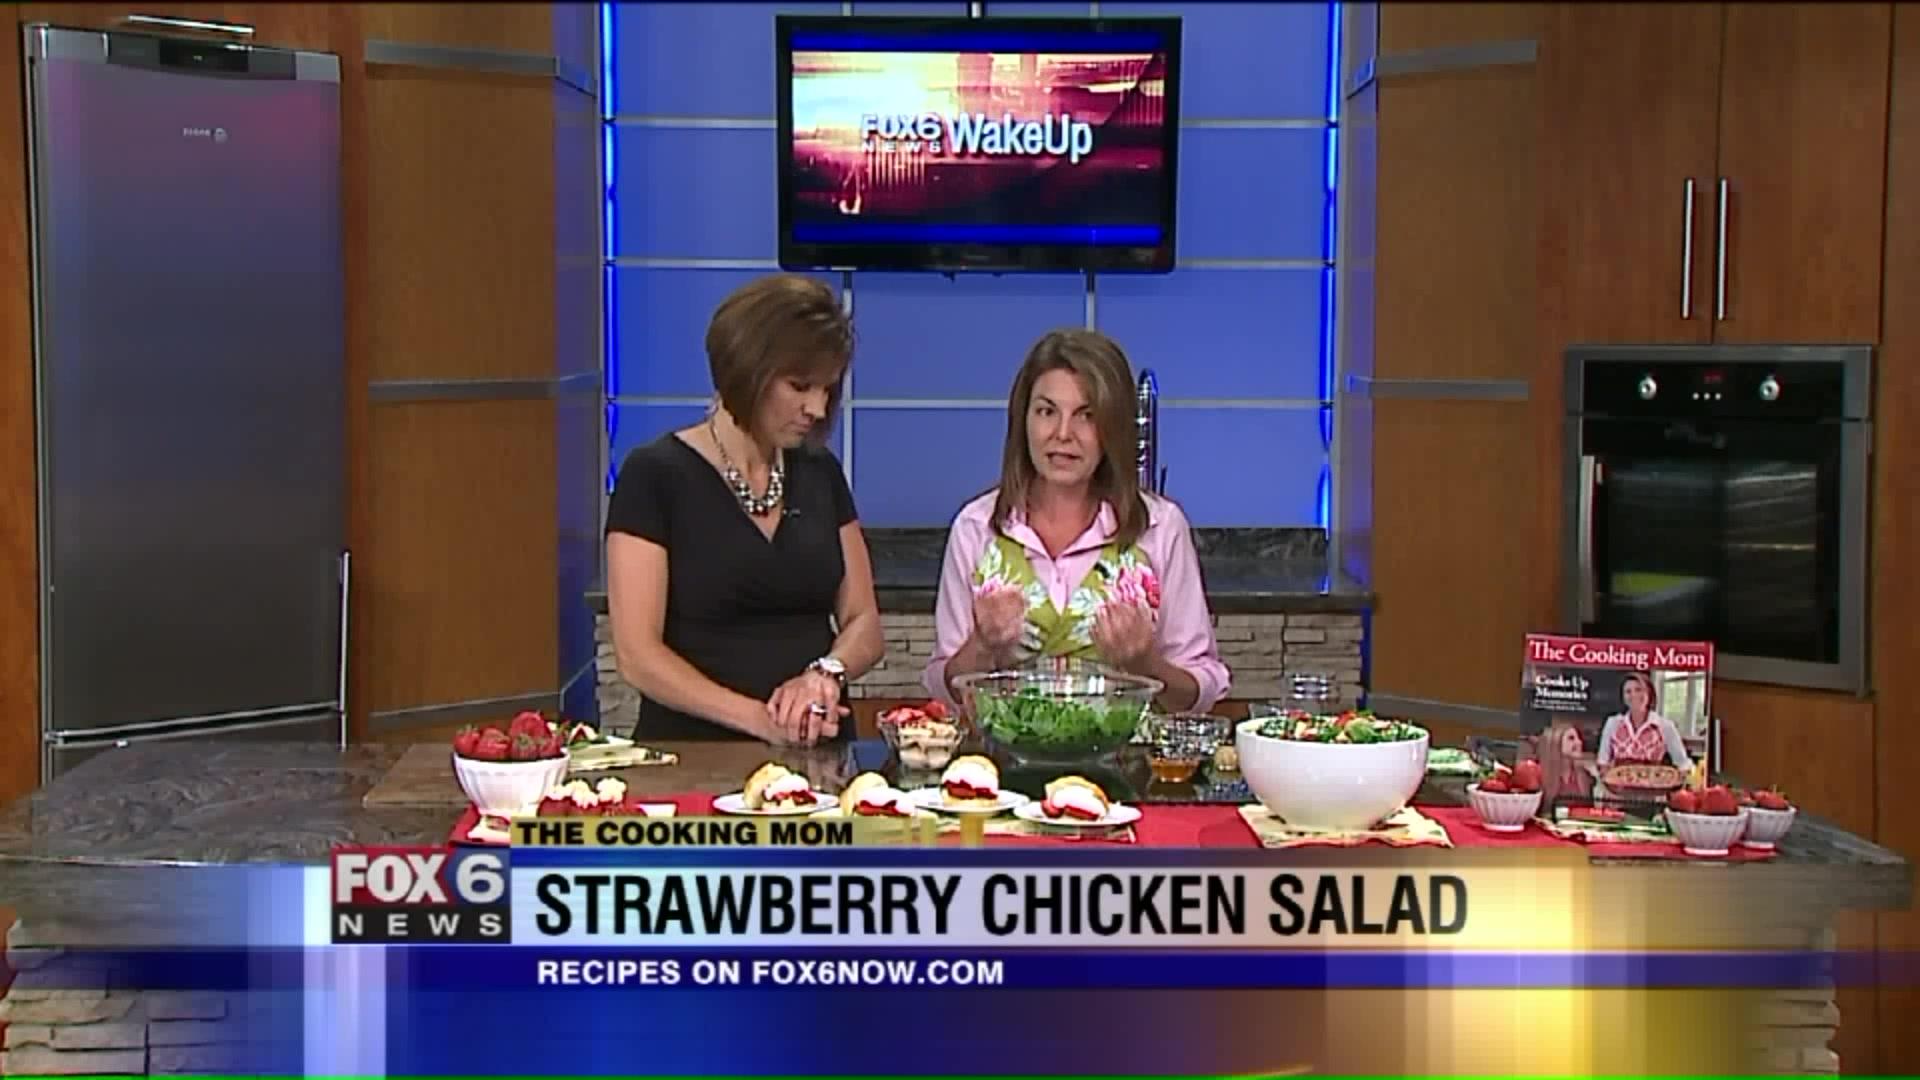 How To Make Strawberry Chicken Salad